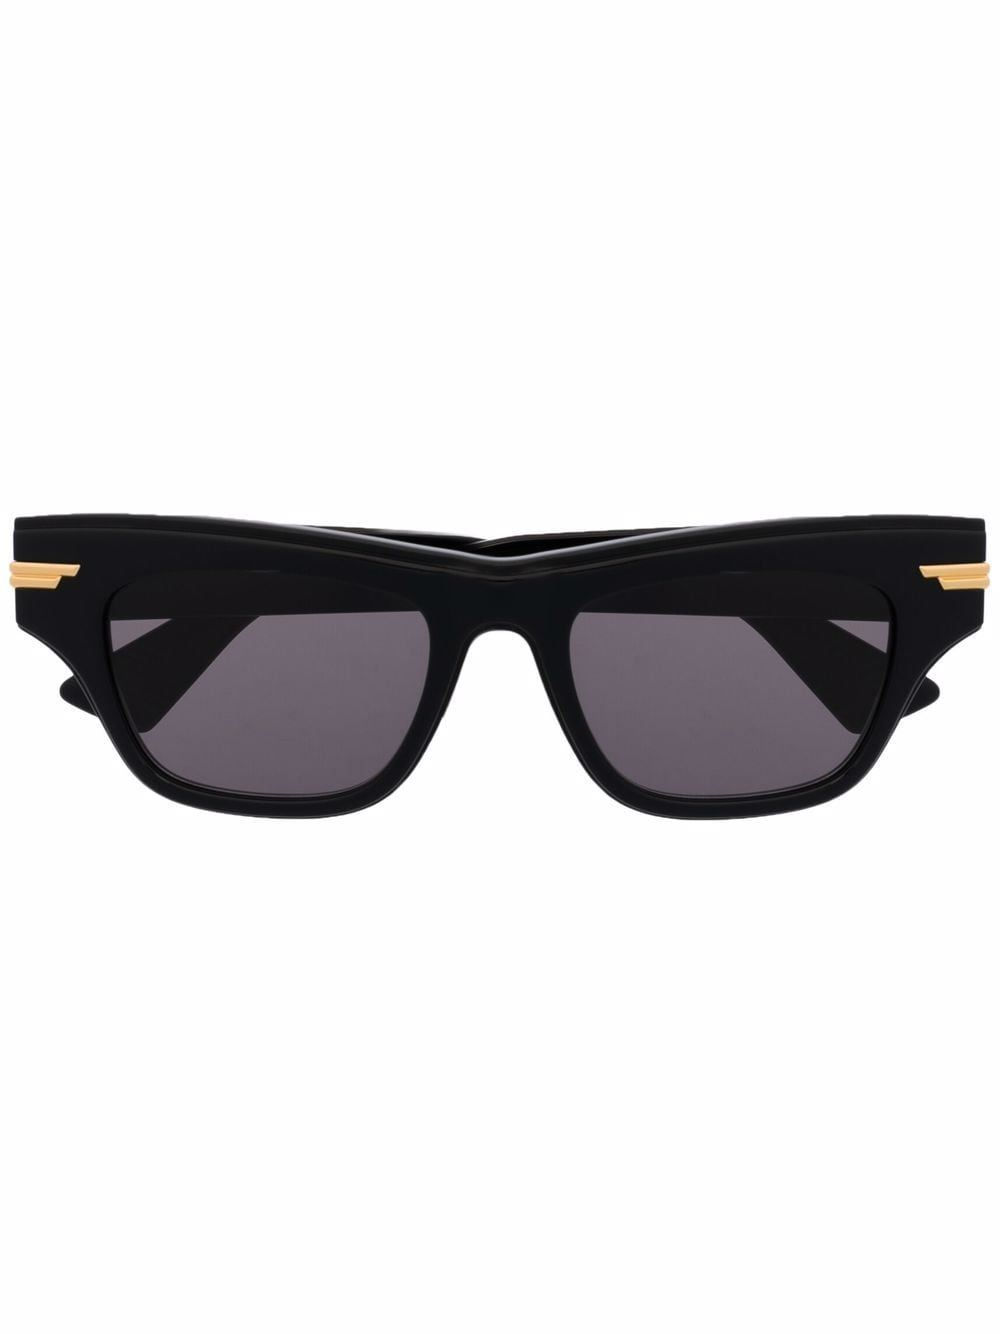 Picture of Bottega Veneta | Rectangle-Frame Tortoiseshell-Effect Sunglasses